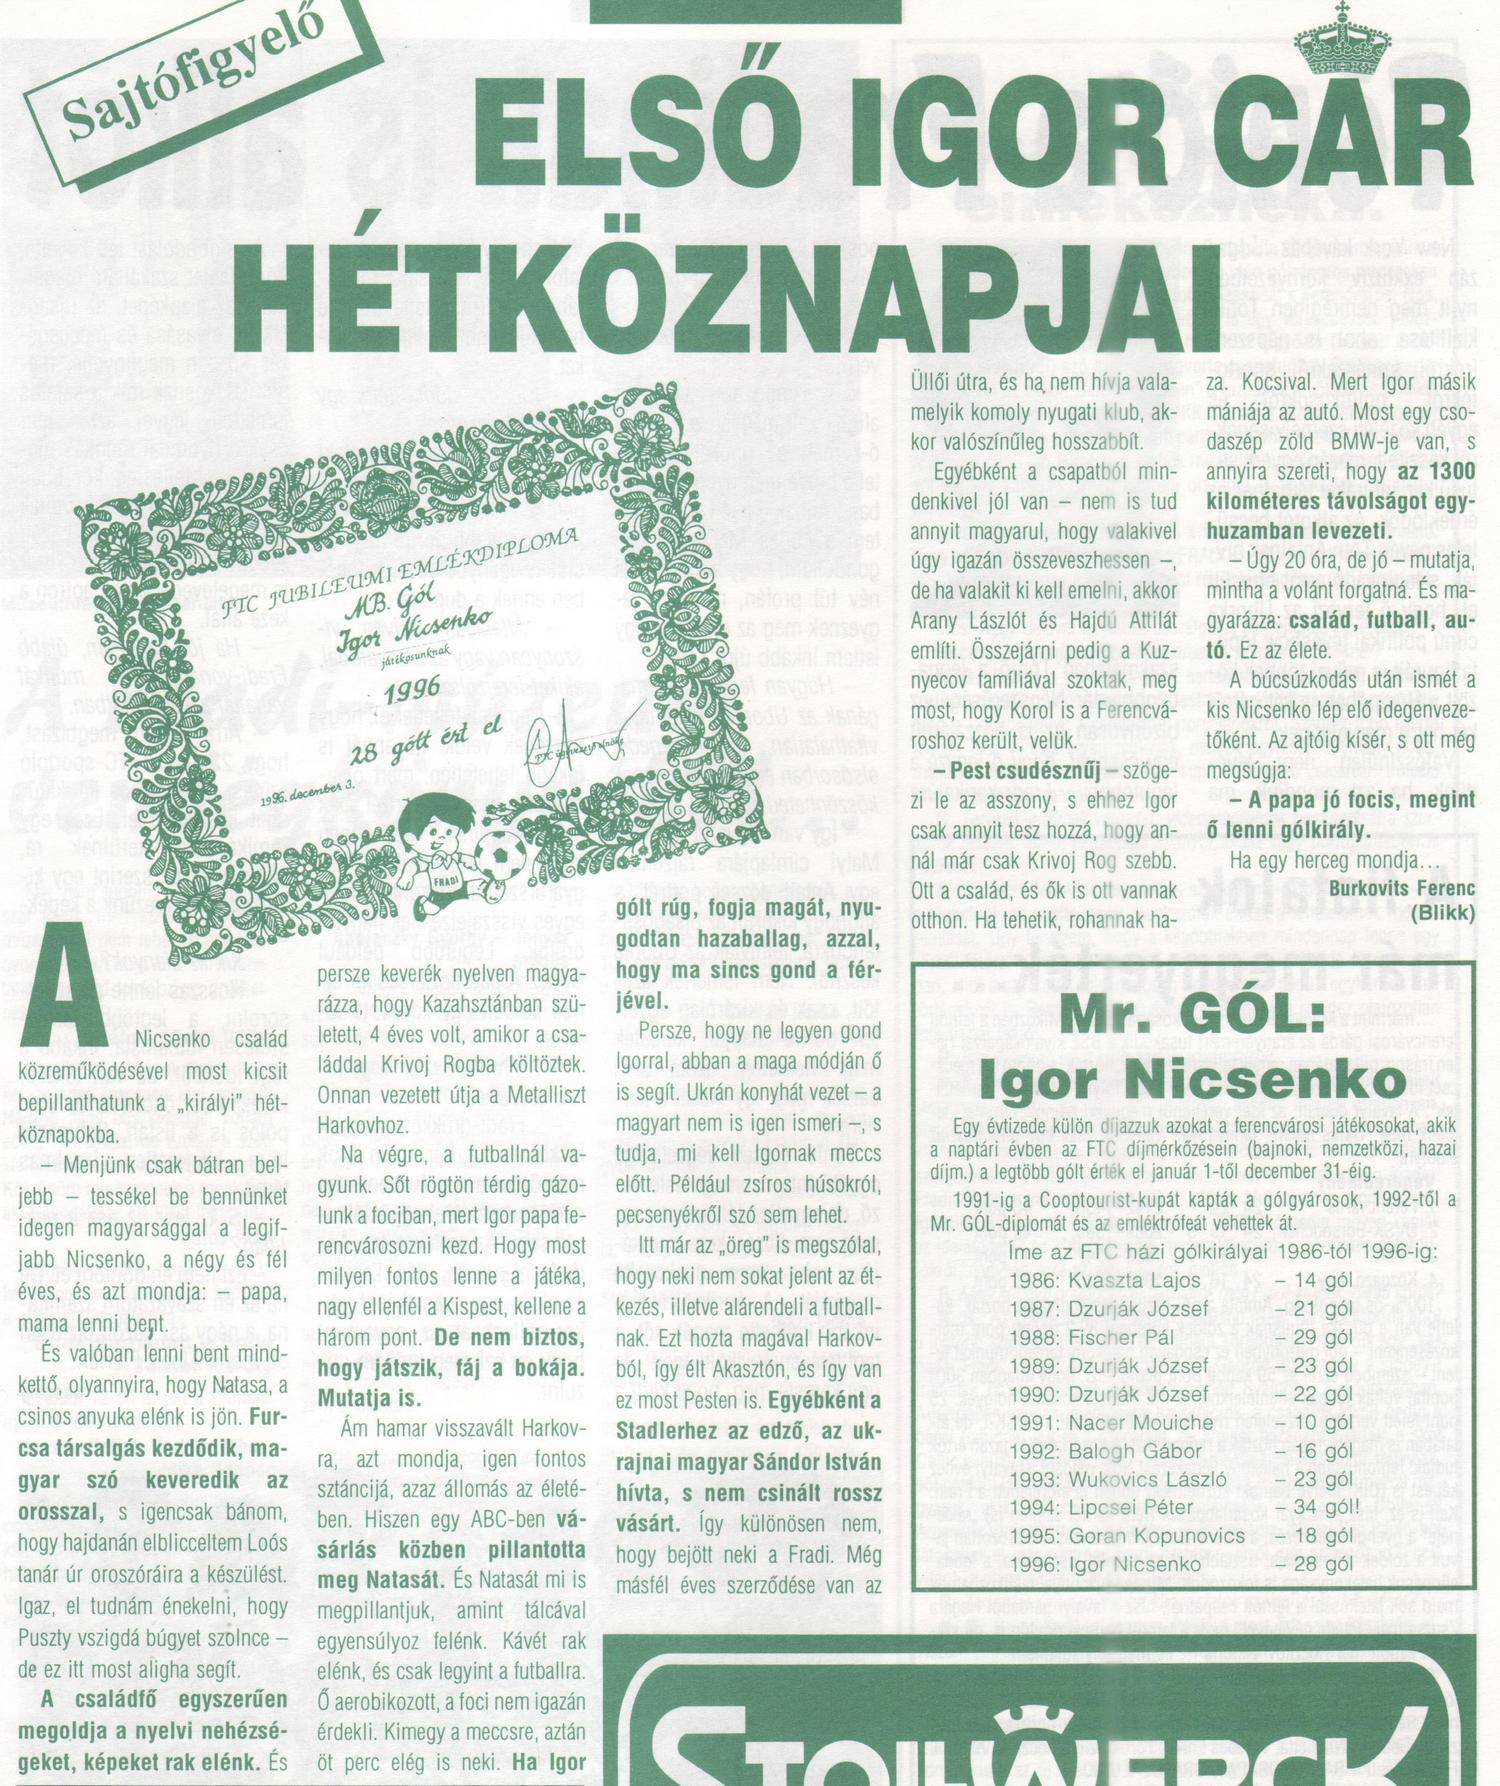 TFU_19970400_FU_004 - 0018